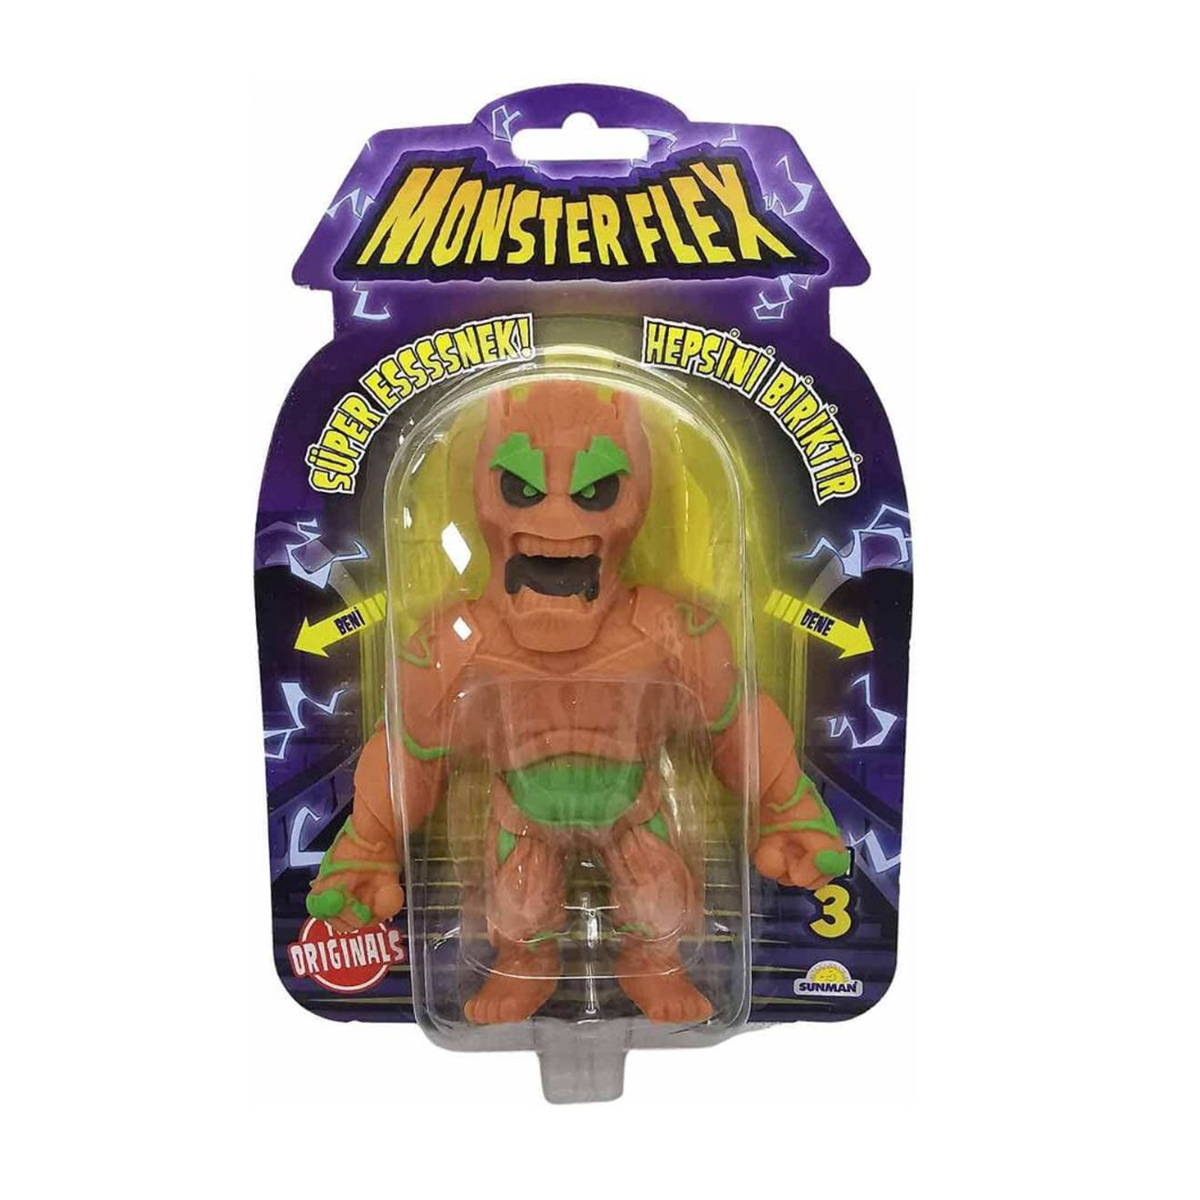 Figurina Monster Flex, Monstrulet care se intinde, S3, Trunkman